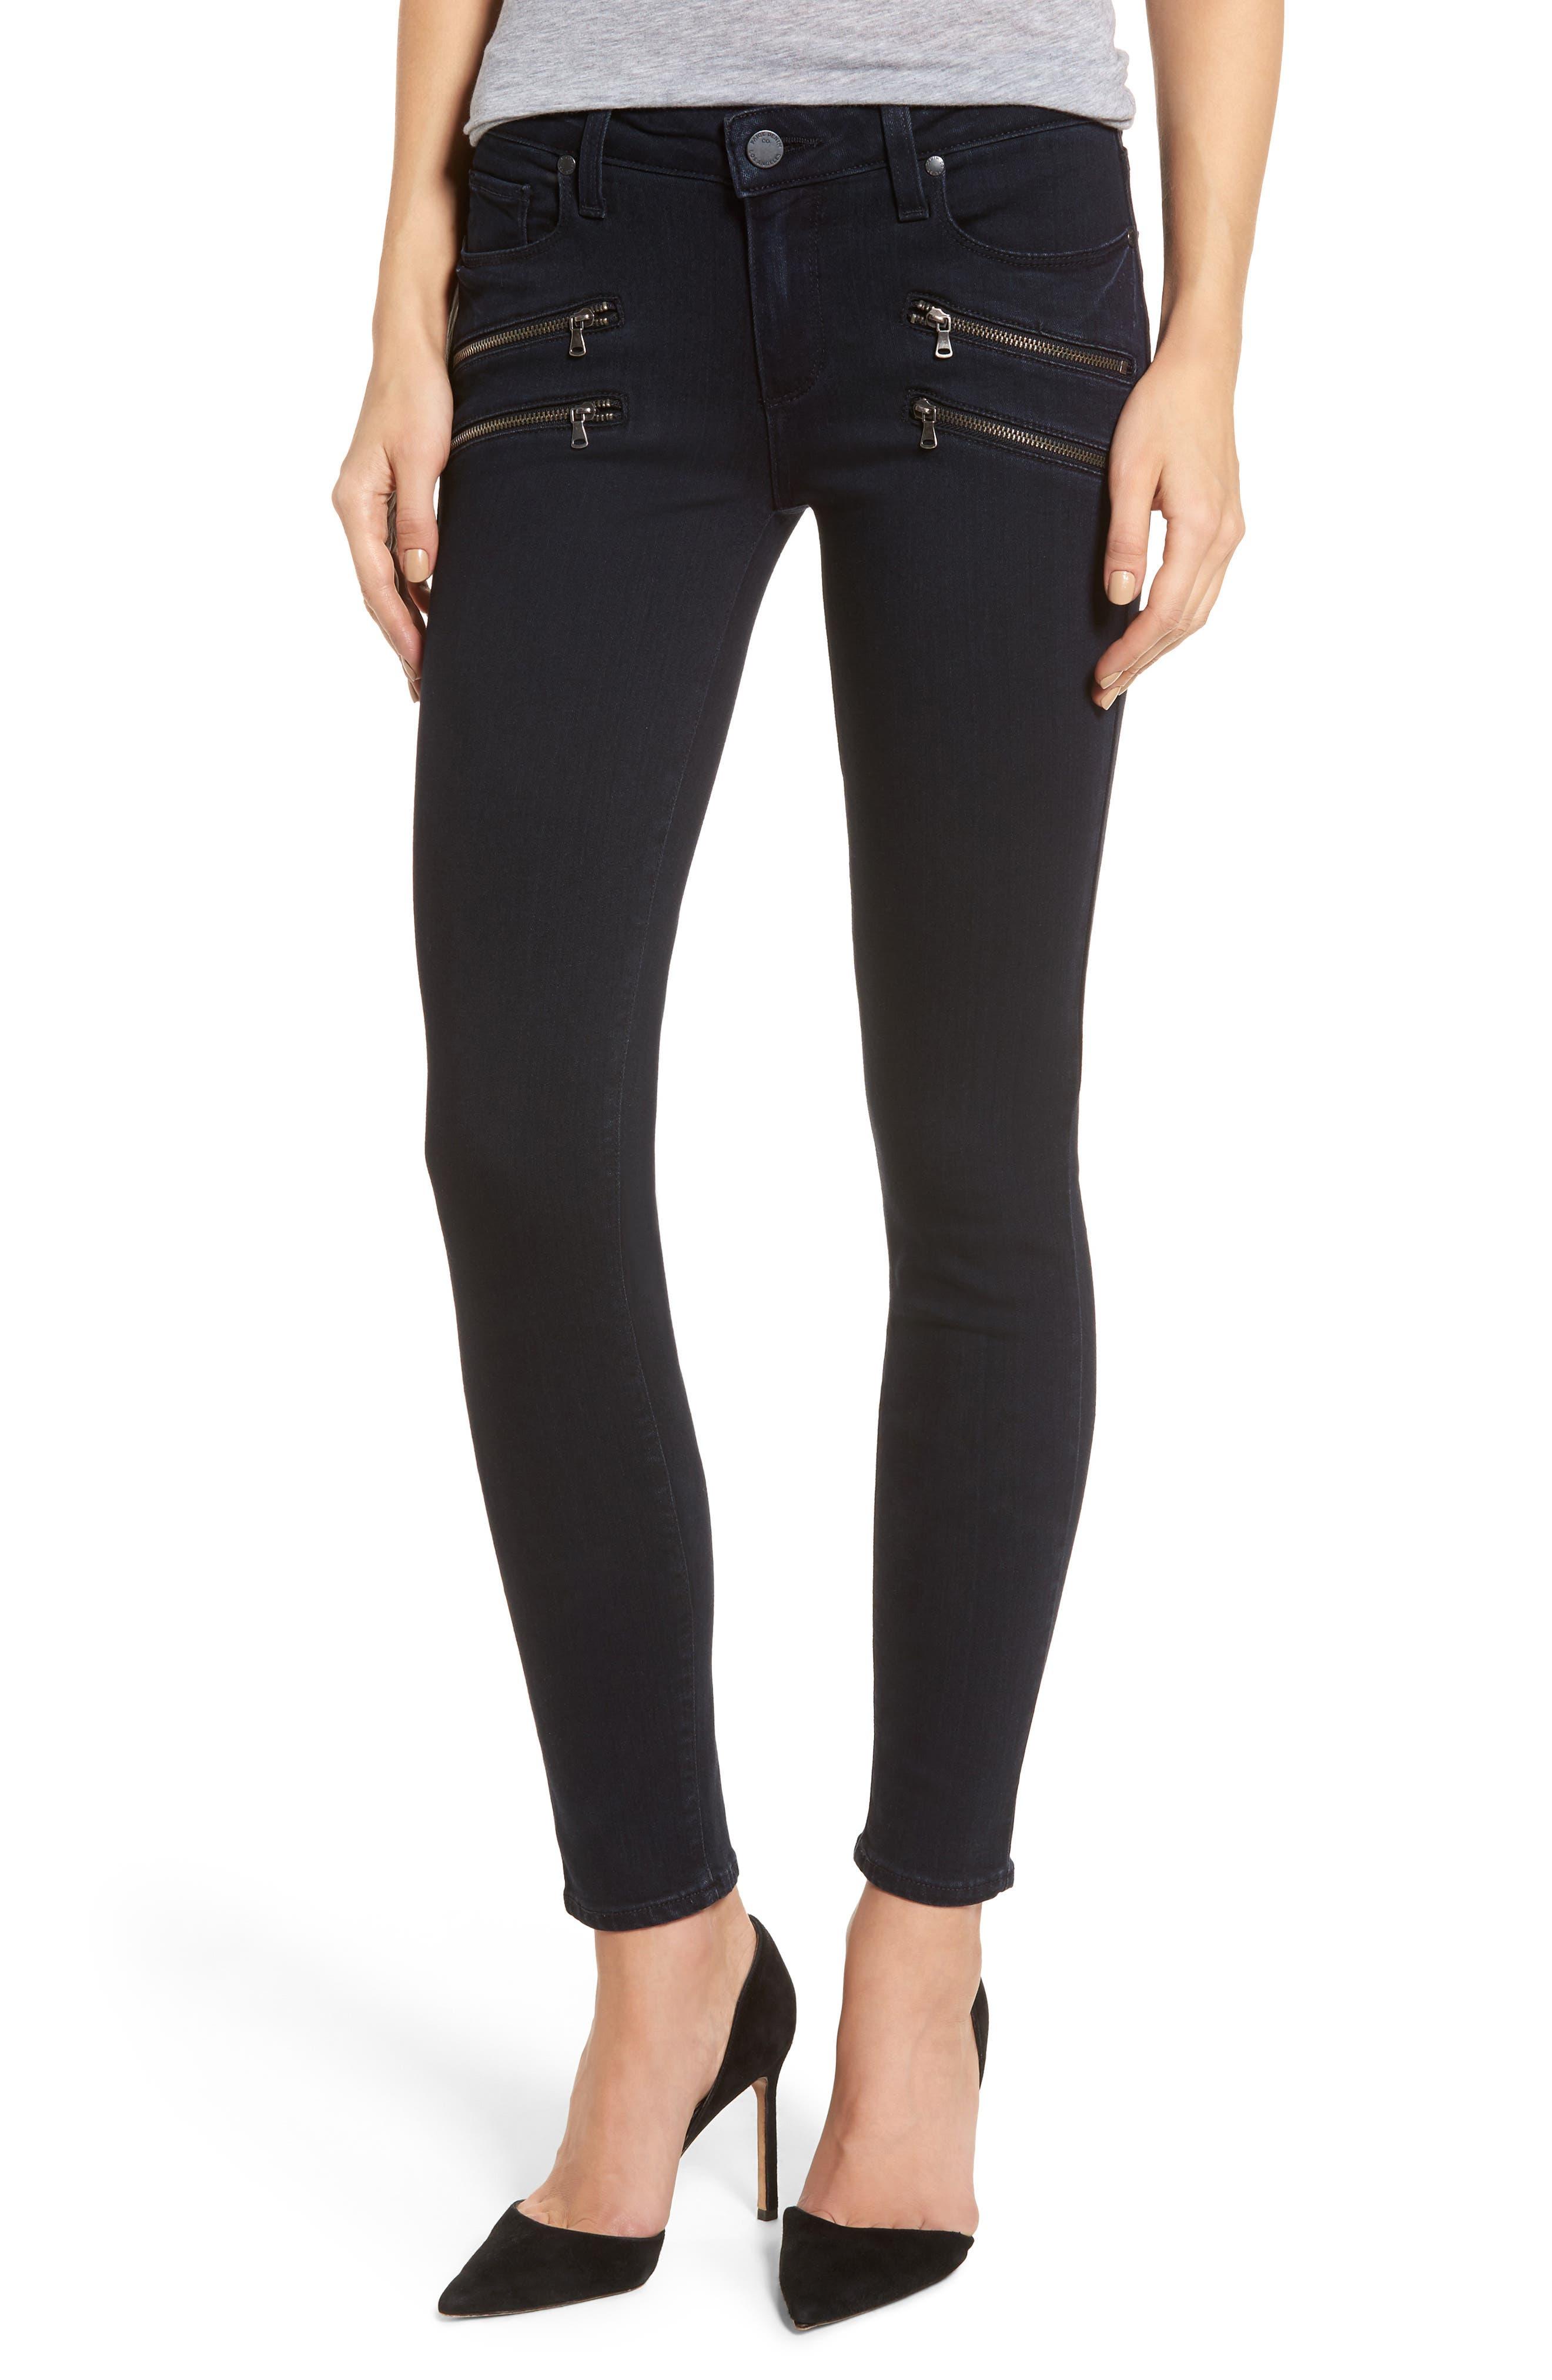 Alternate Image 1 Selected - PAIGE Transcend - Edgemont Ultra Skinny Jeans (Cherie)